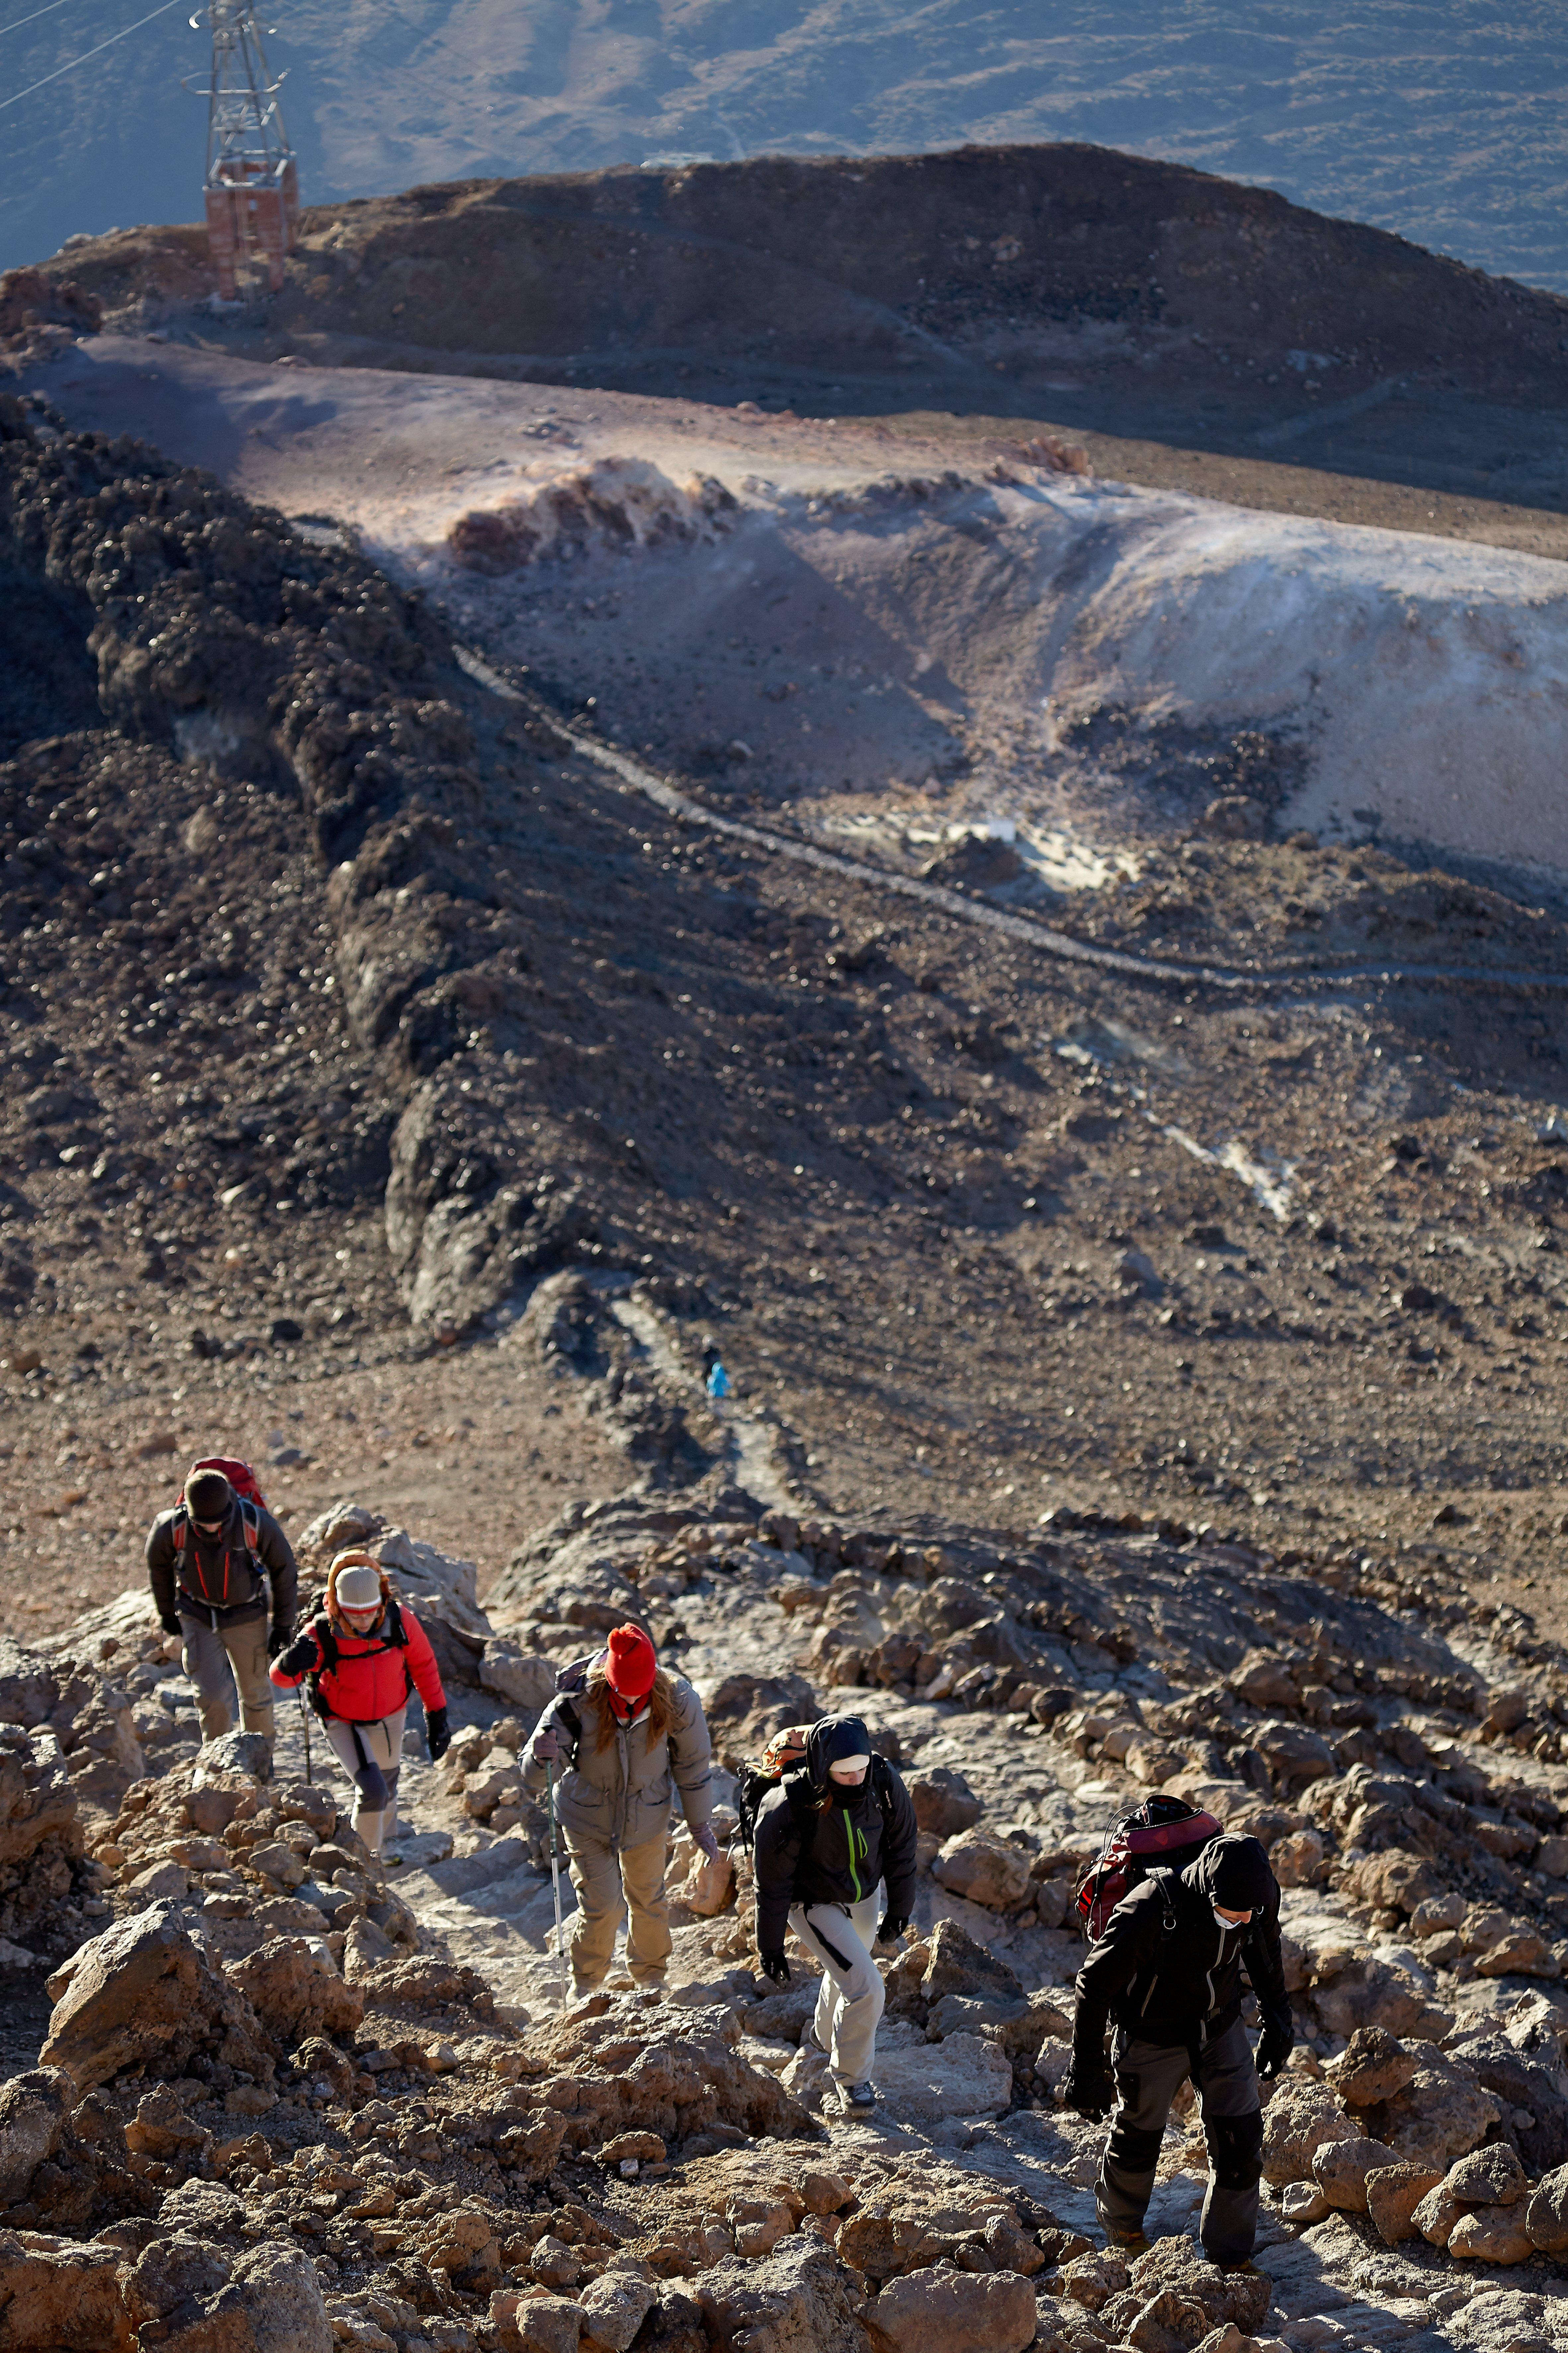 Salire sul Teide a piedi da Montaña Blanca